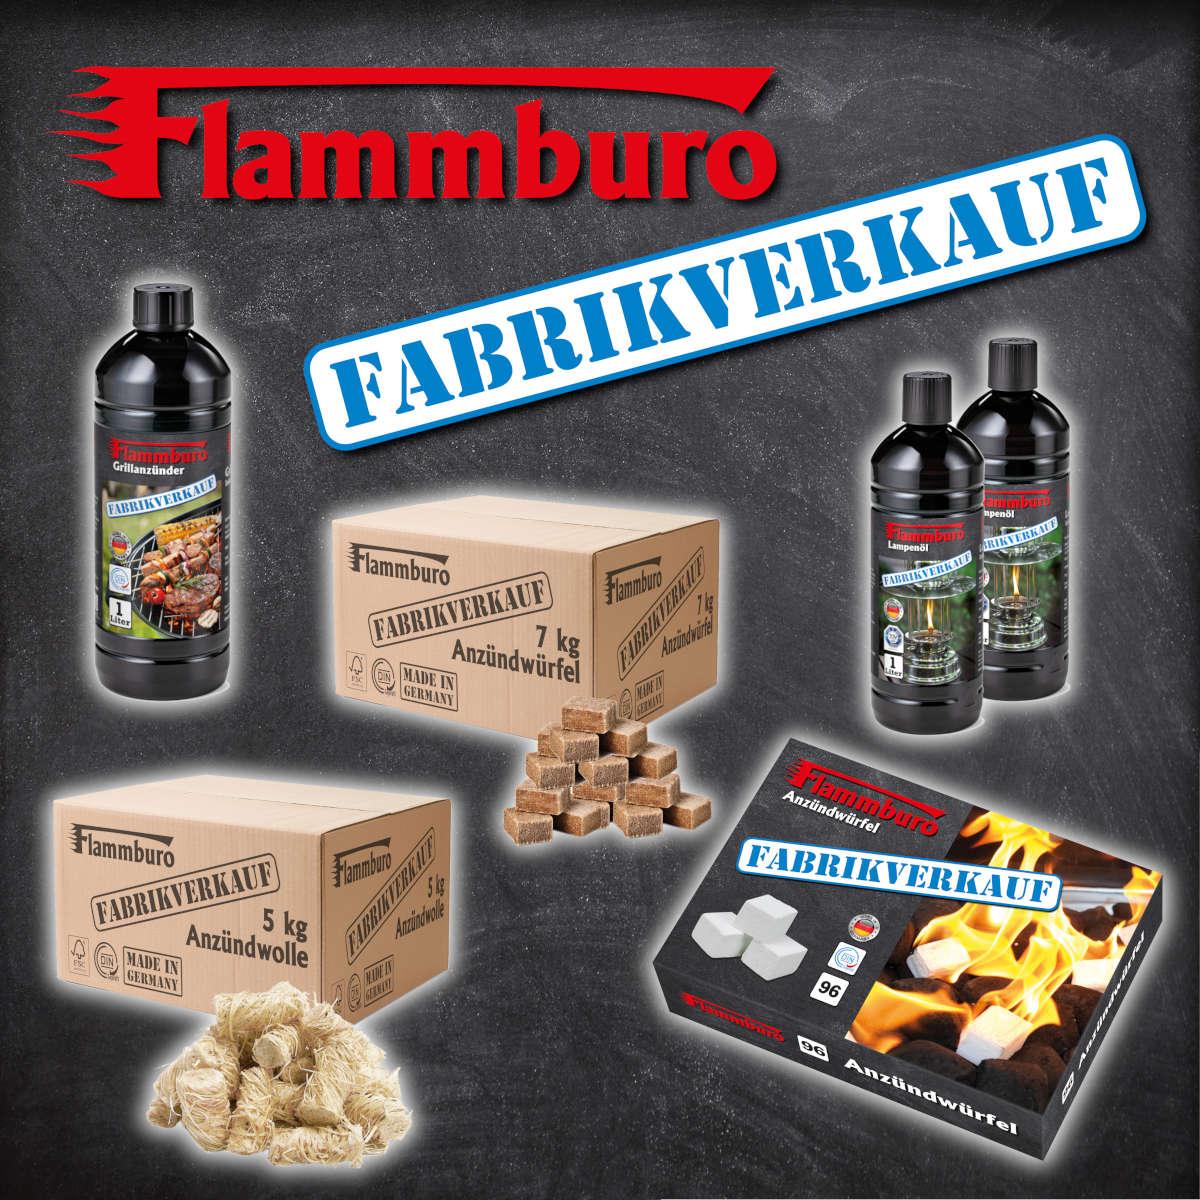 FLAMMBURO Anzündwolle Anzündwürfel Grillanzünder Lampenöl